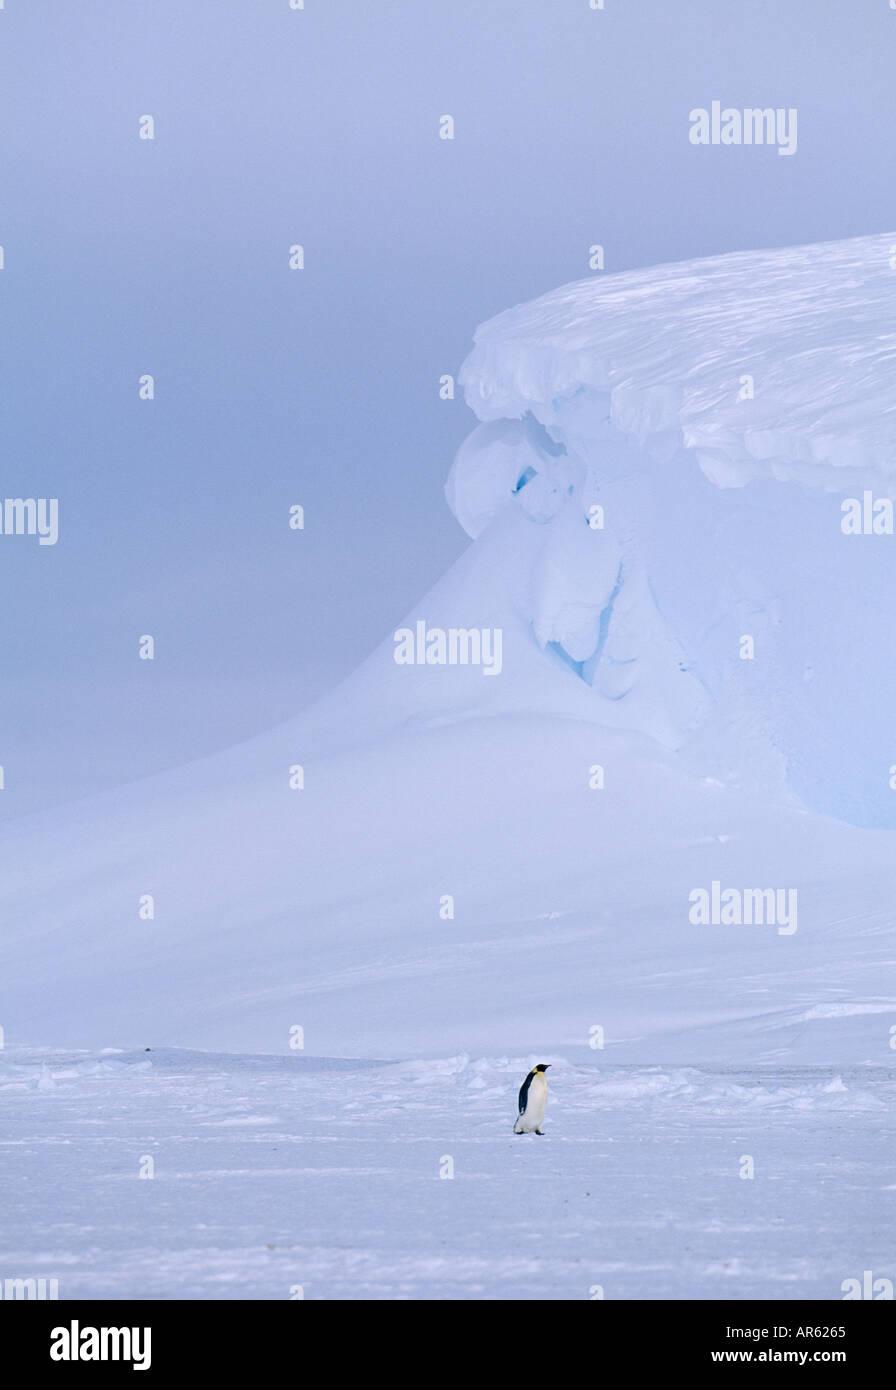 Kaiserpinguine Aptenodytes forsteri Lone nach Rückkehr in die Kolonie über Meereis der Weddell Meer Antarktis november Stockbild